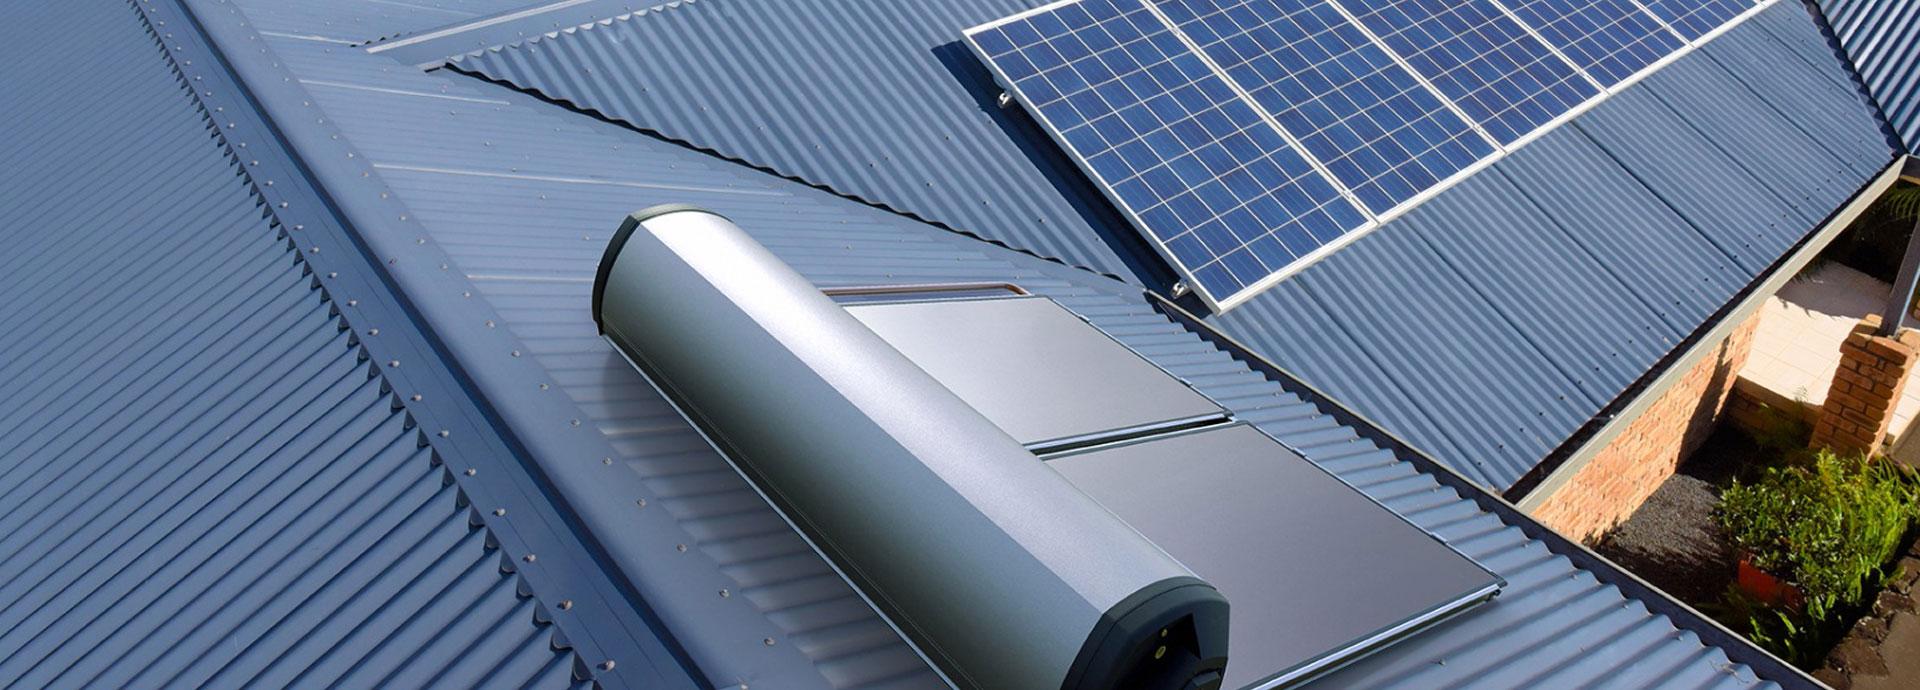 solahart solar hot water victorian solar